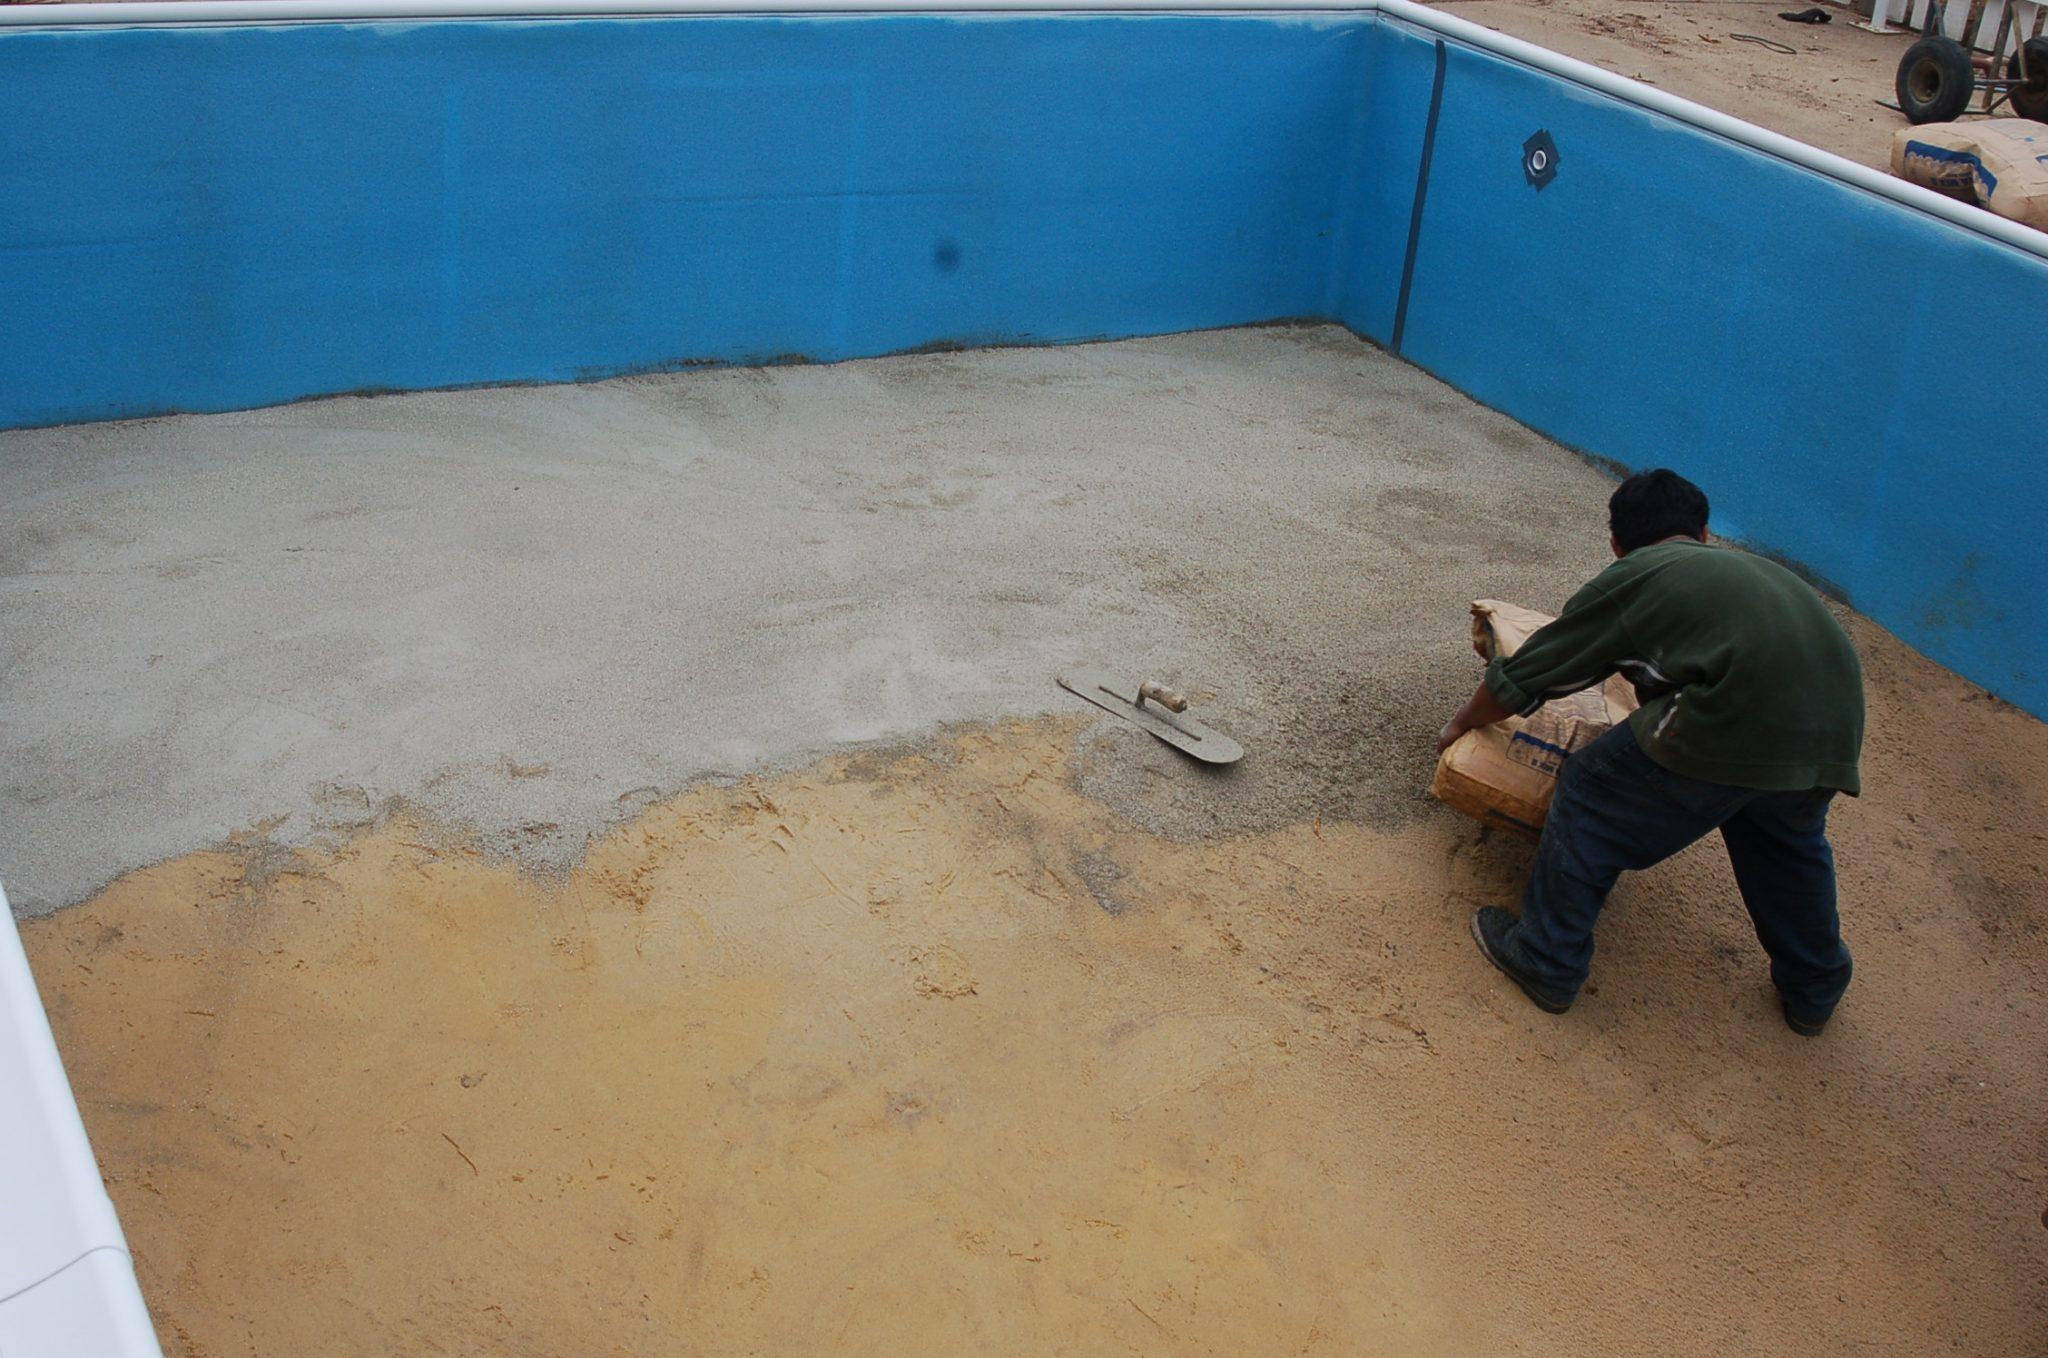 padding ground solarpro com heater outdoor mat dp pool pools wave solar above amazon blue garden ez for floor